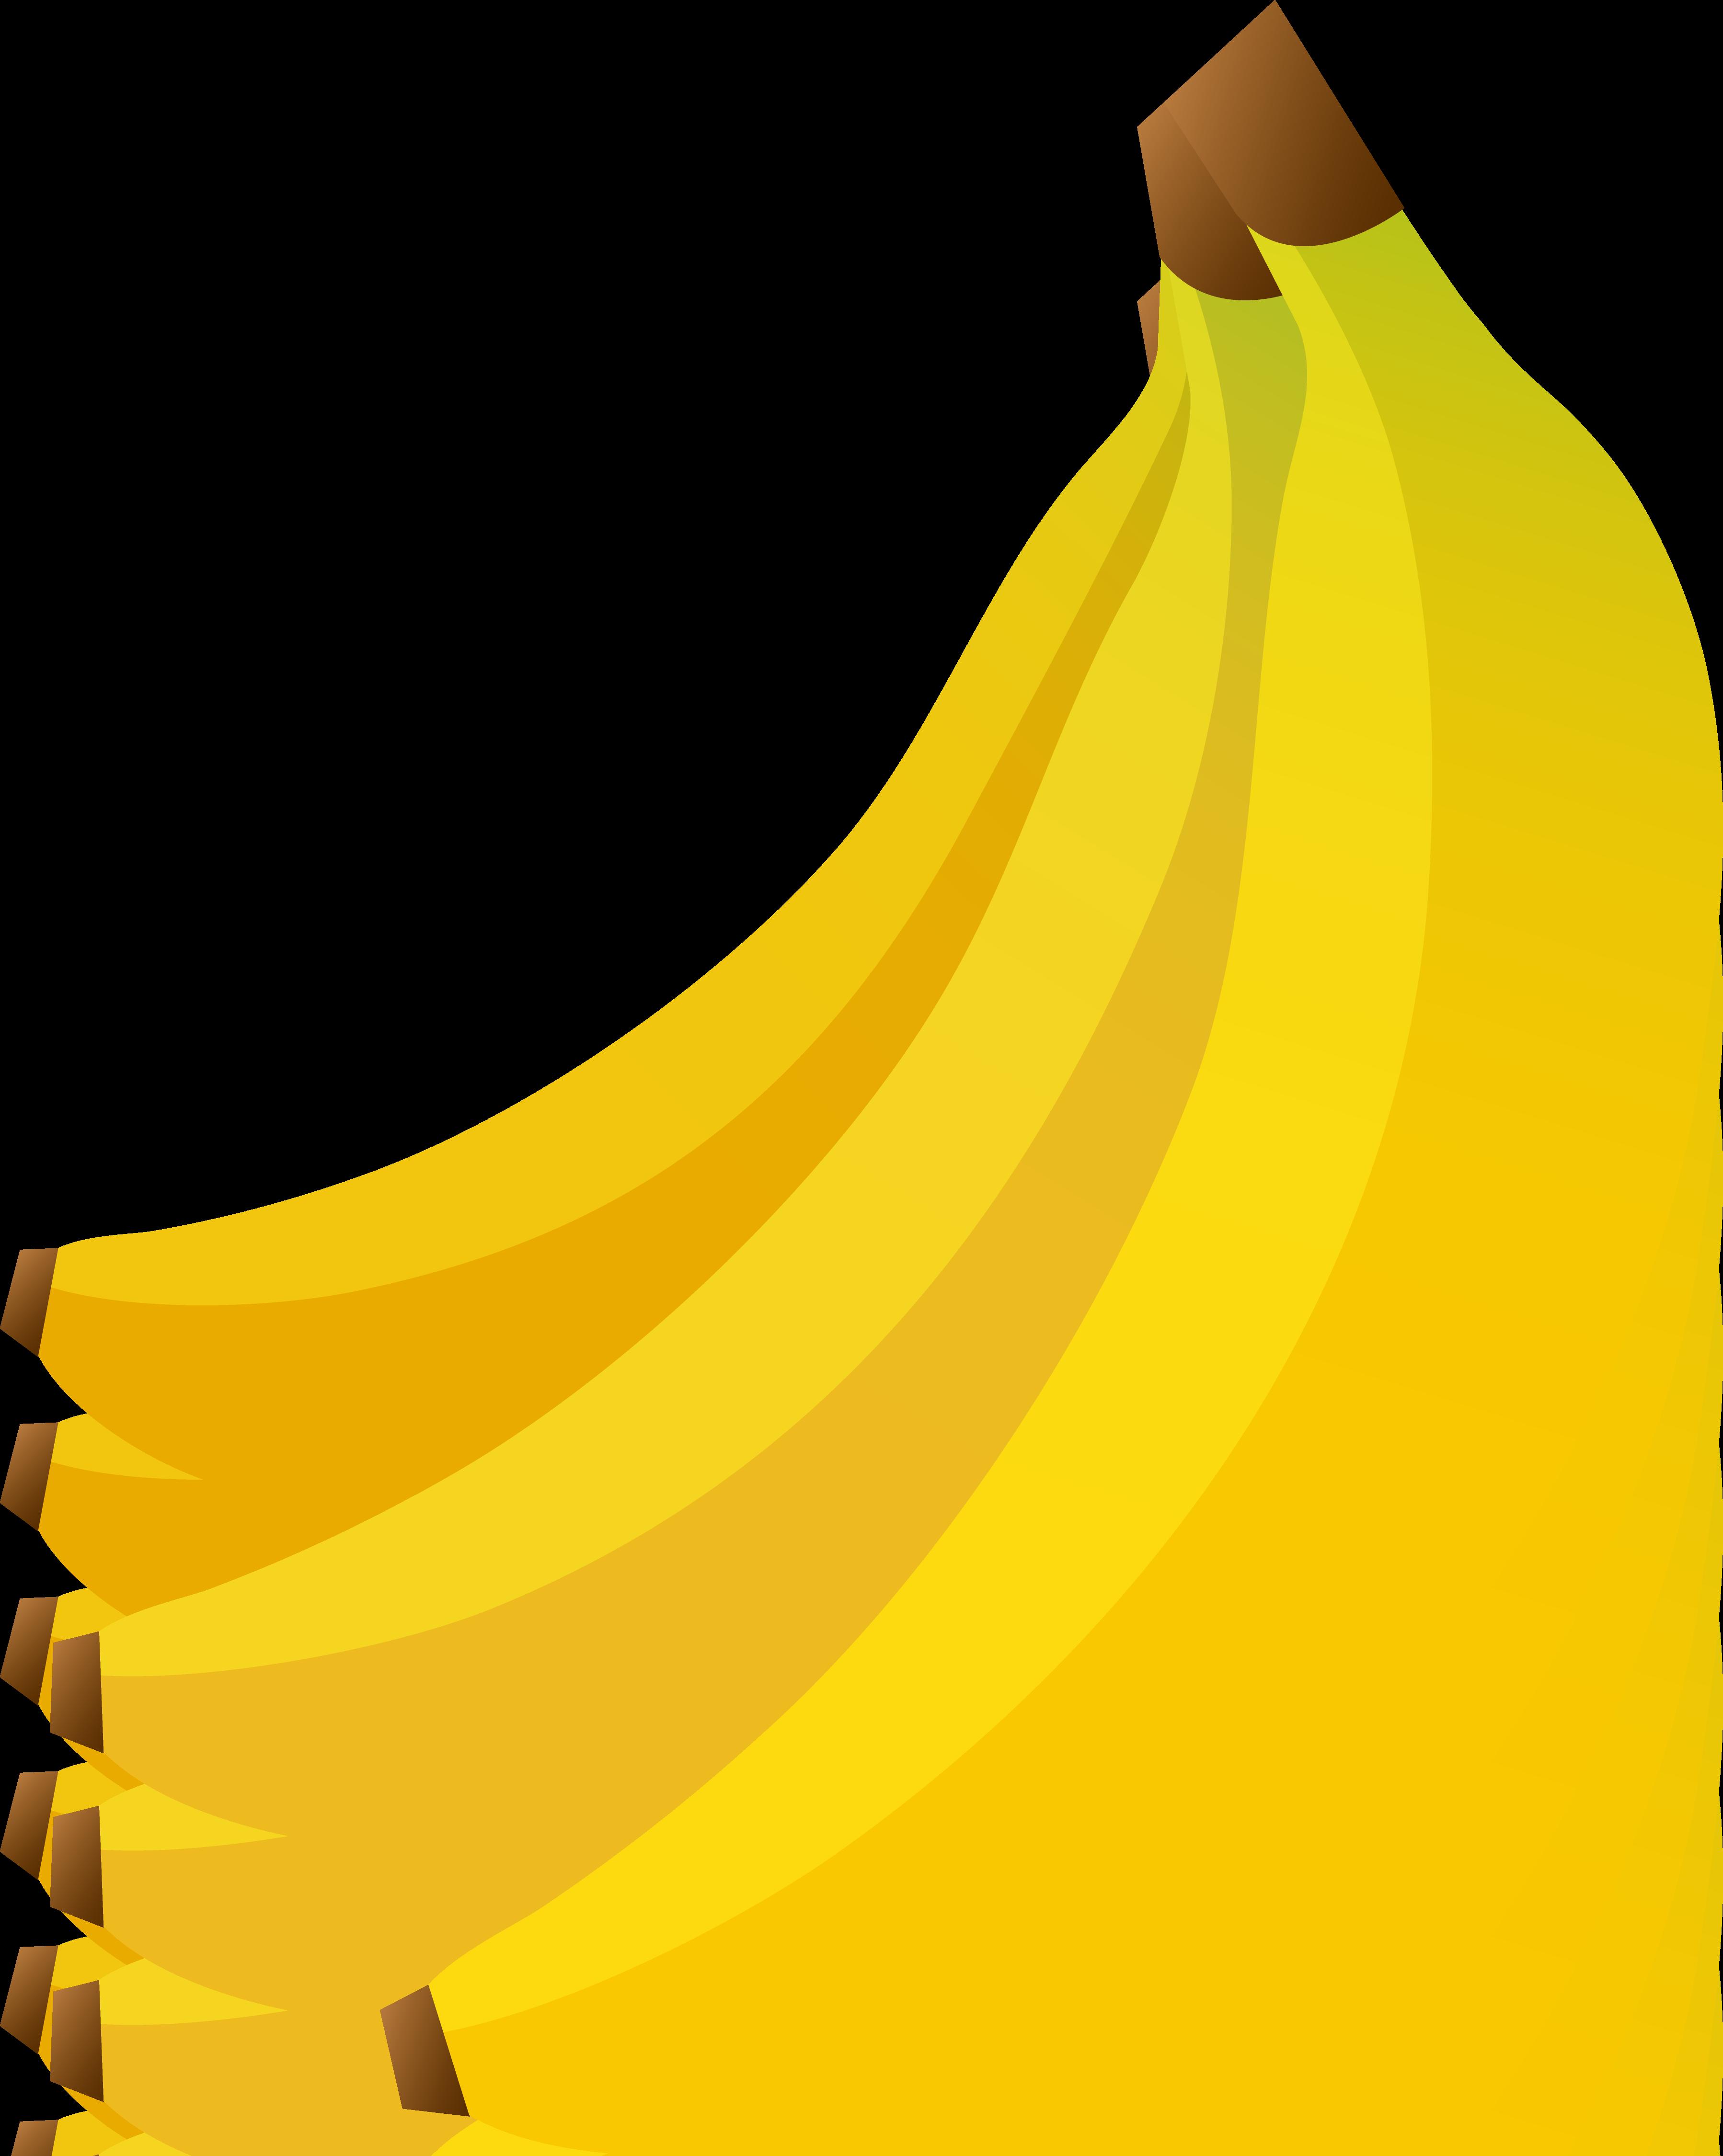 3596x4501 Bunch Of Three Bananas